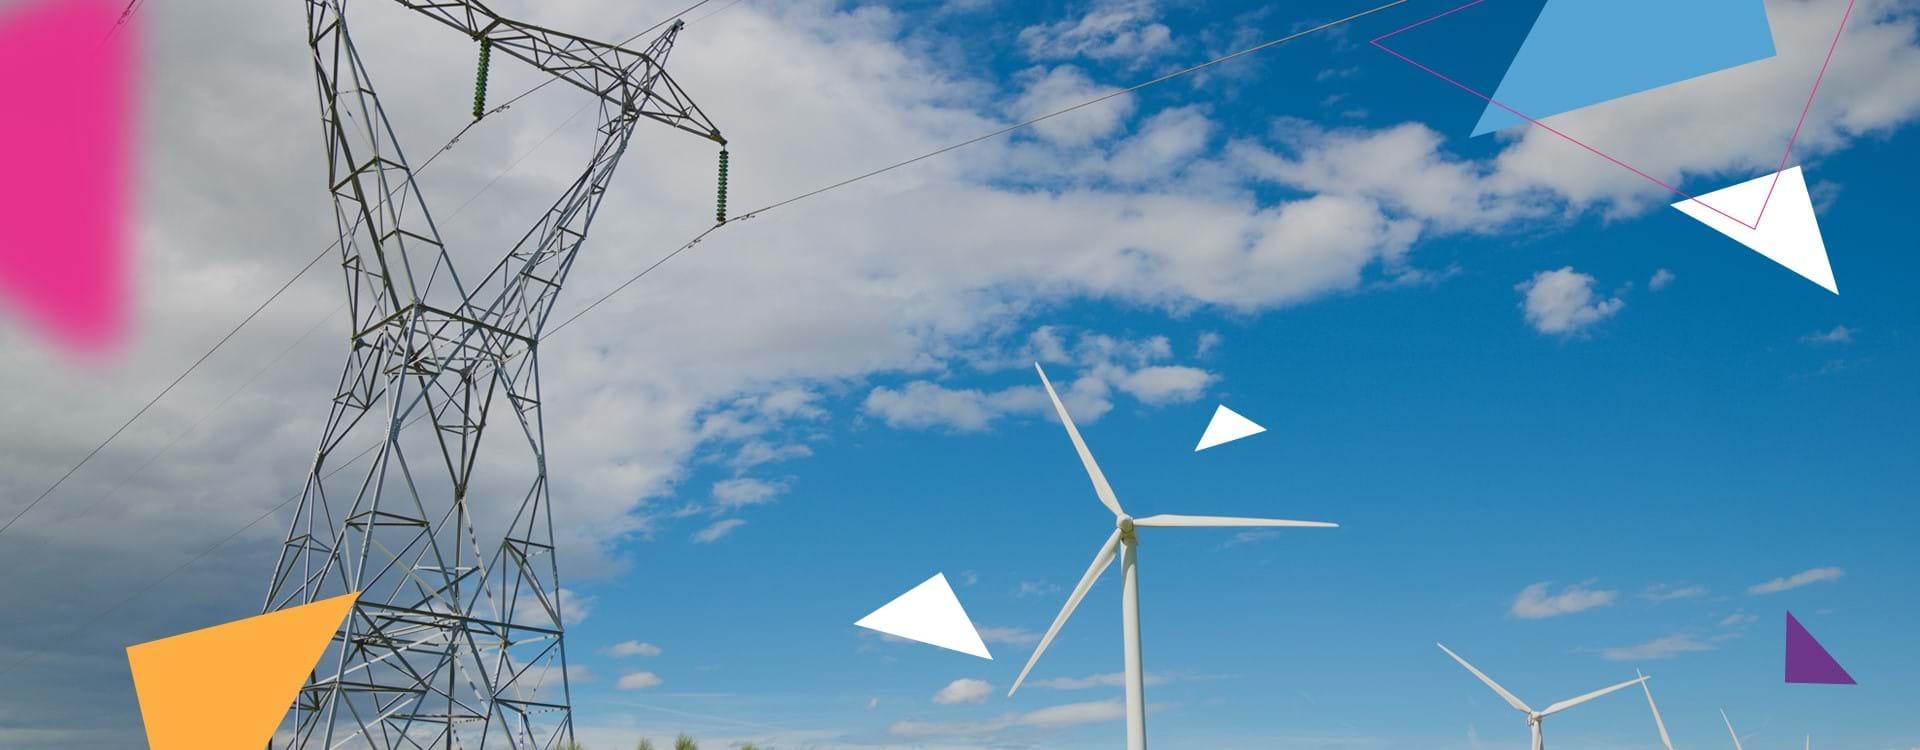 The changing profile of UK energy generation